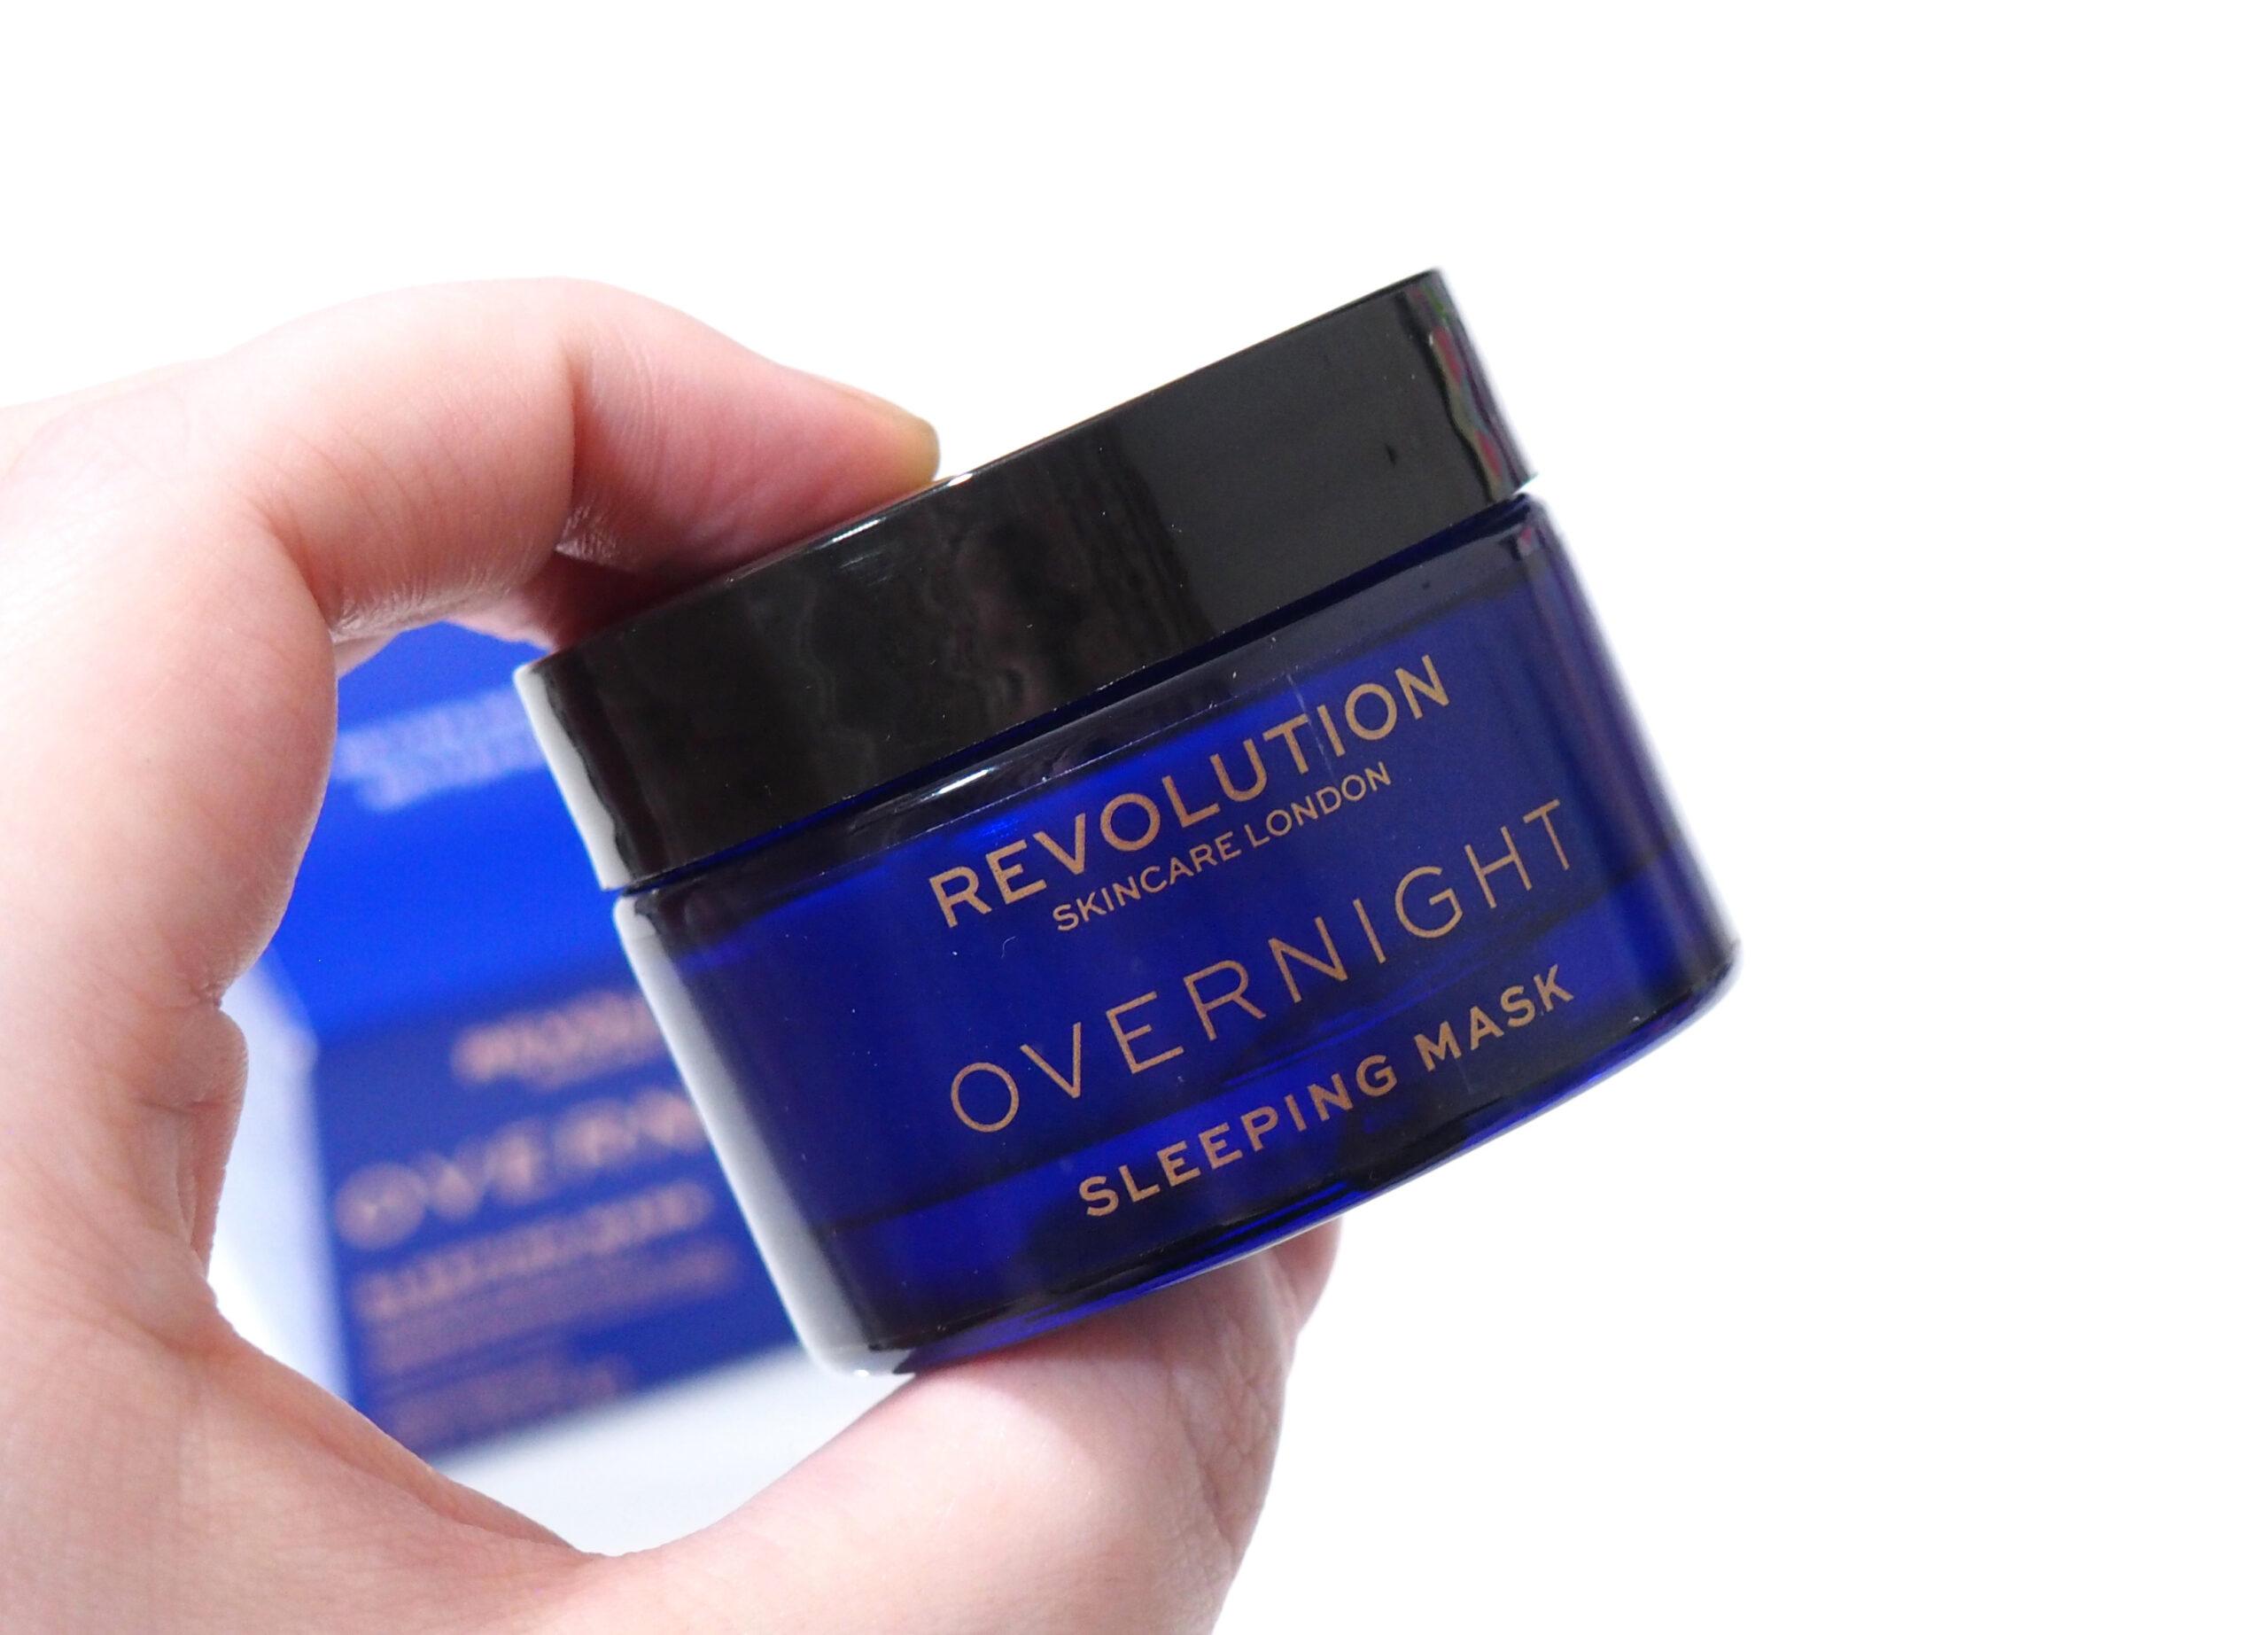 Revolution Skincare Overnight Sleeping Mask Review